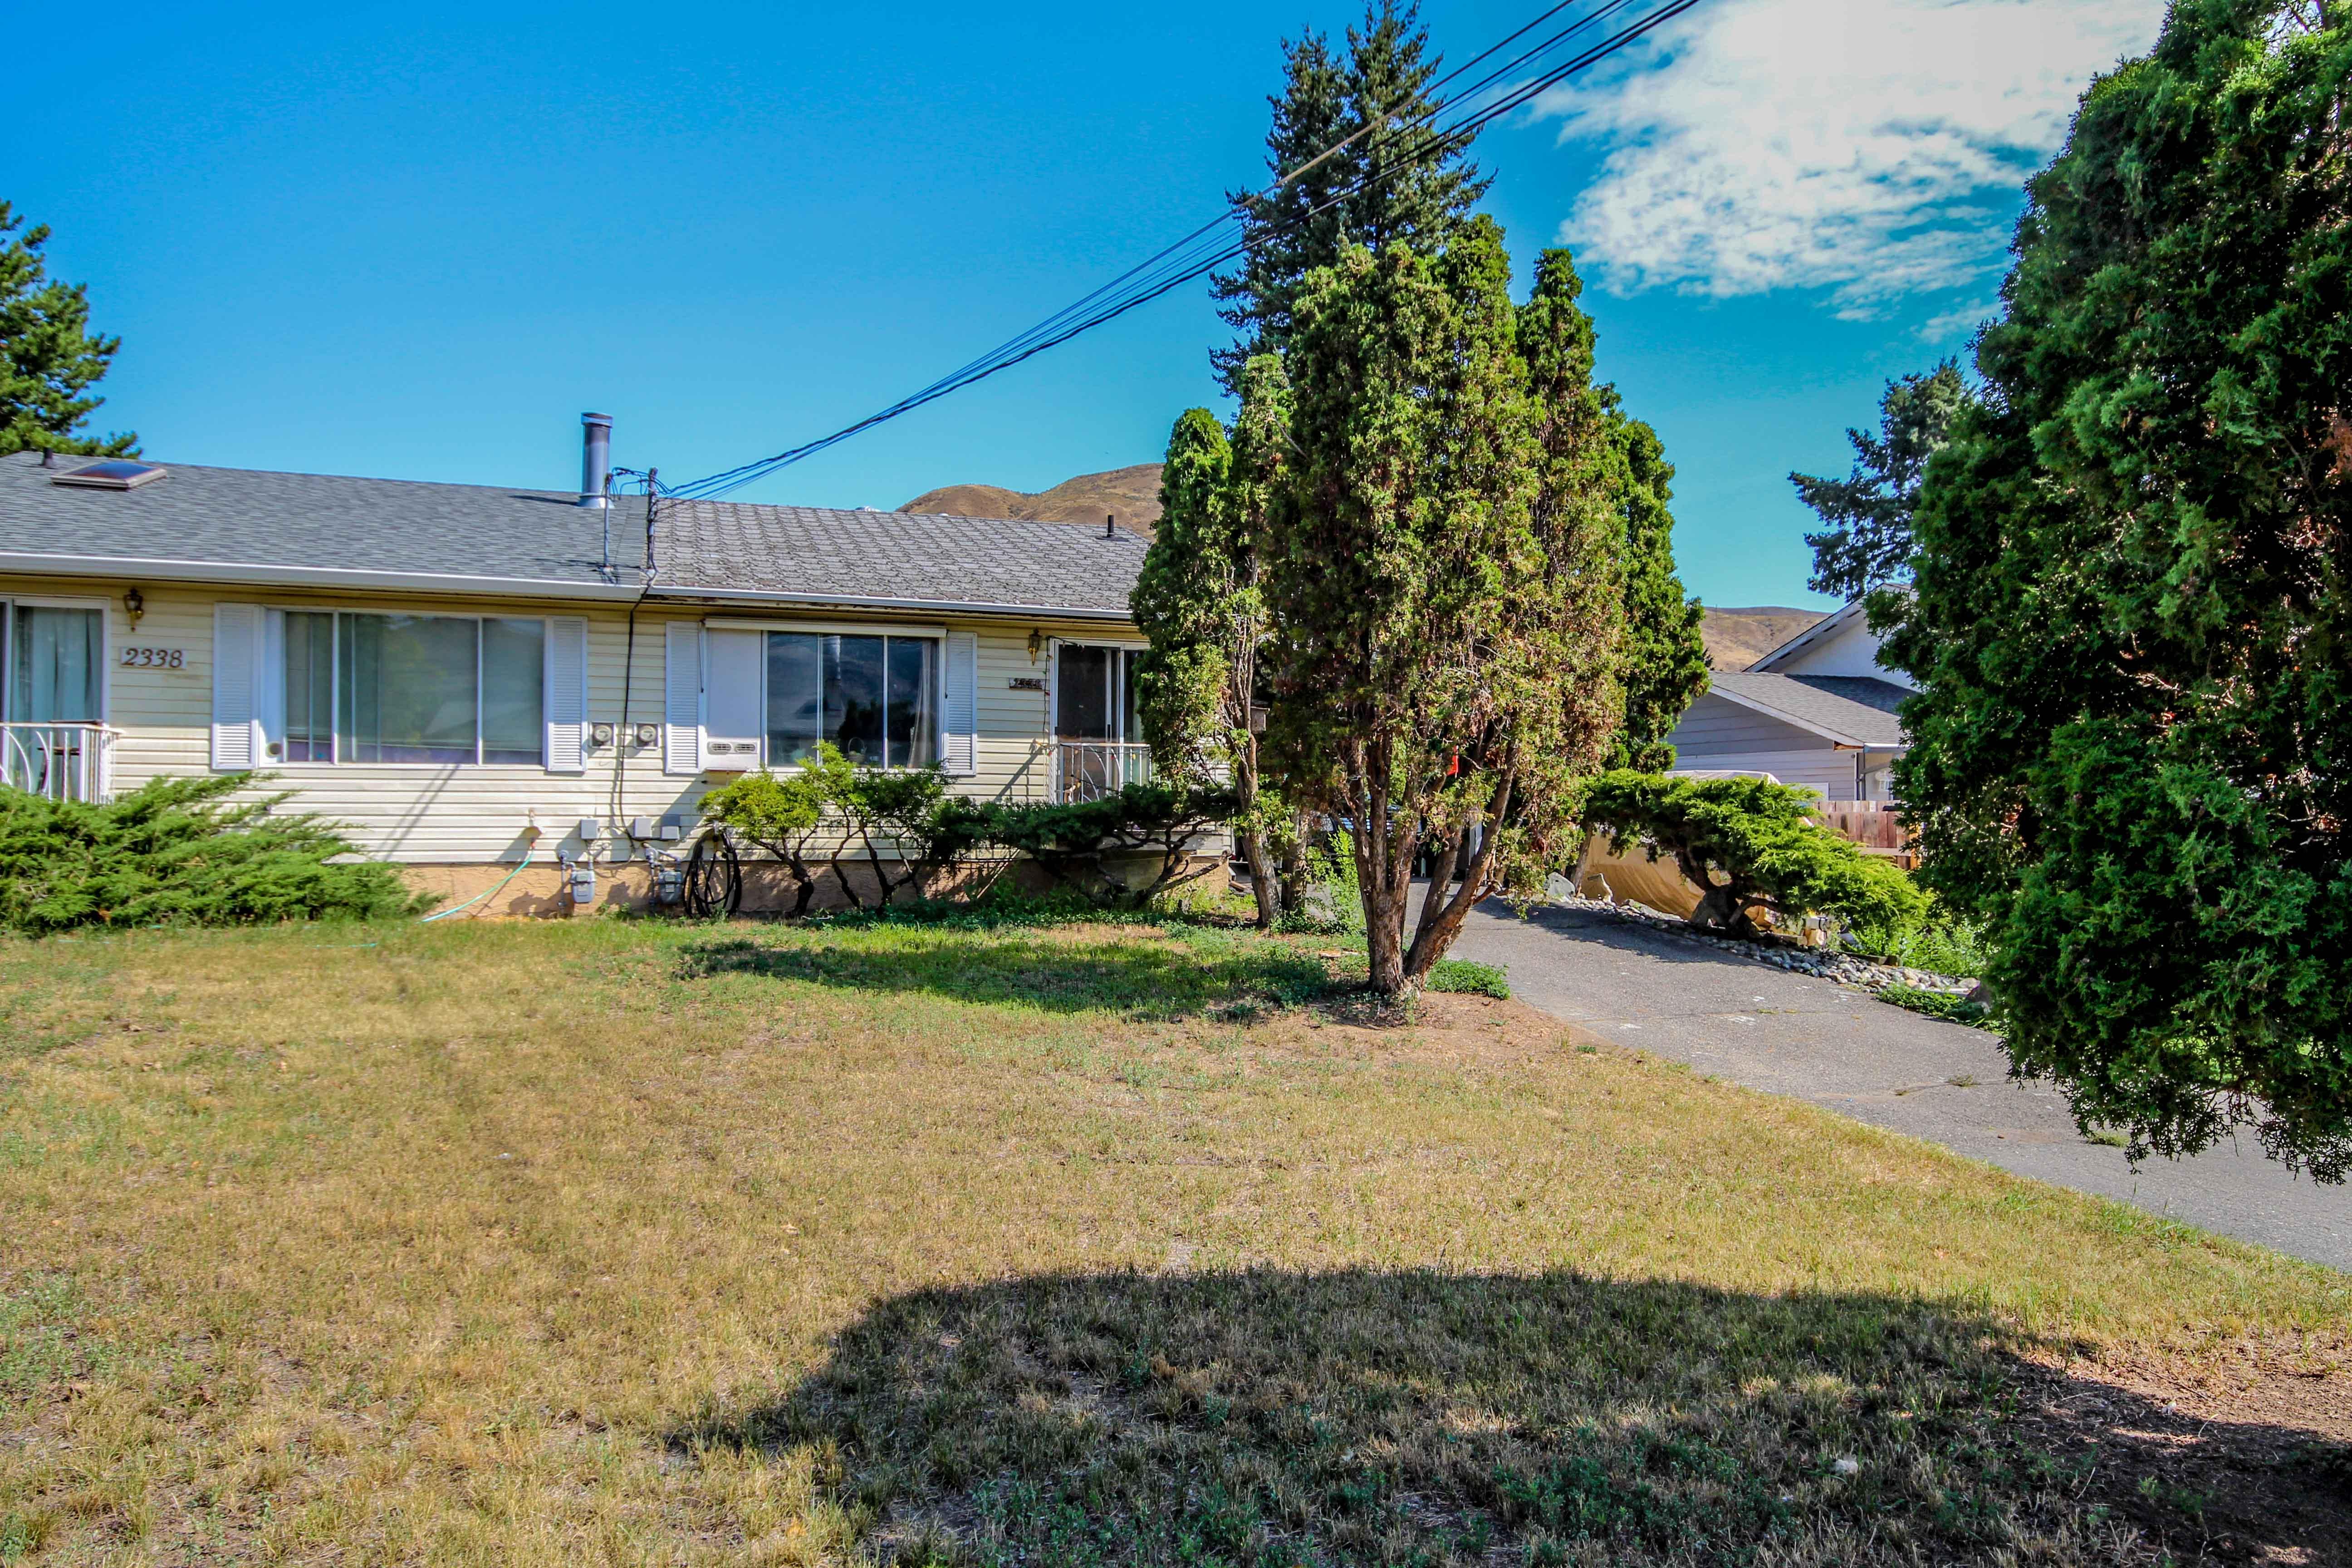 2336 Bossert Avenue, Brocklehurst, Kamloops, BC